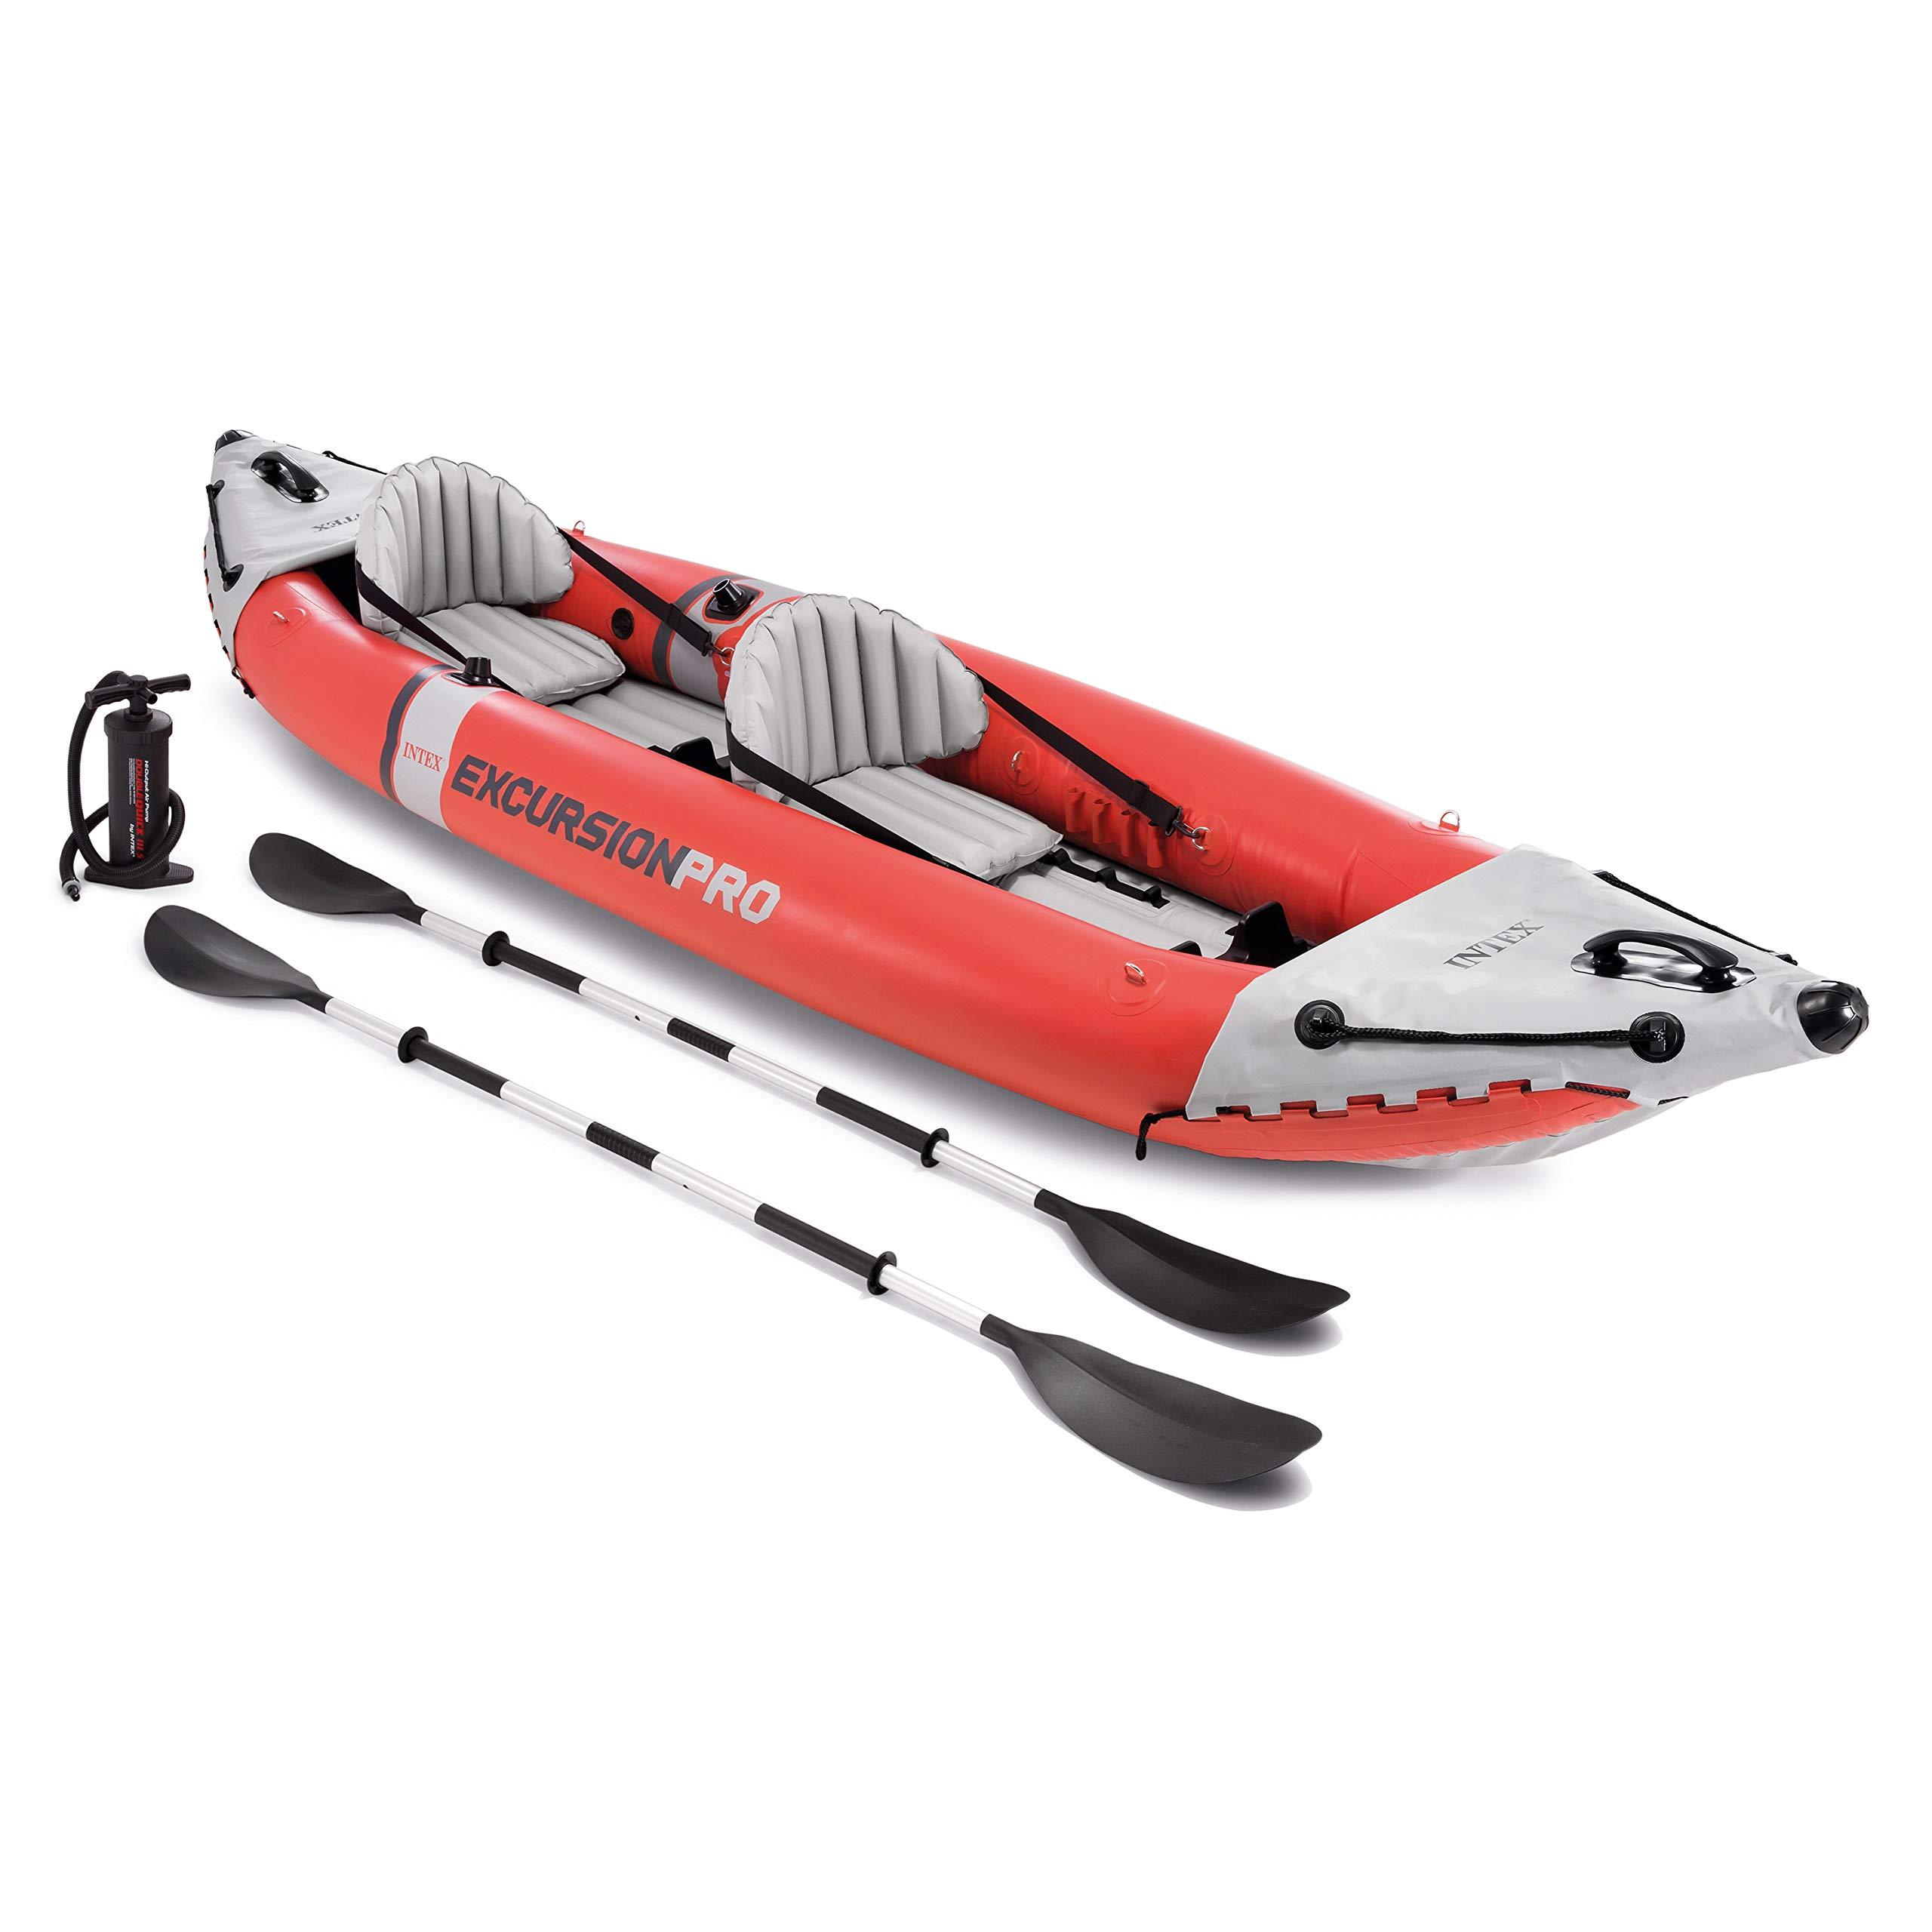 Intex Excursion Pro Kayak, Professional Series Inflatable Fishing Kayak by Intex